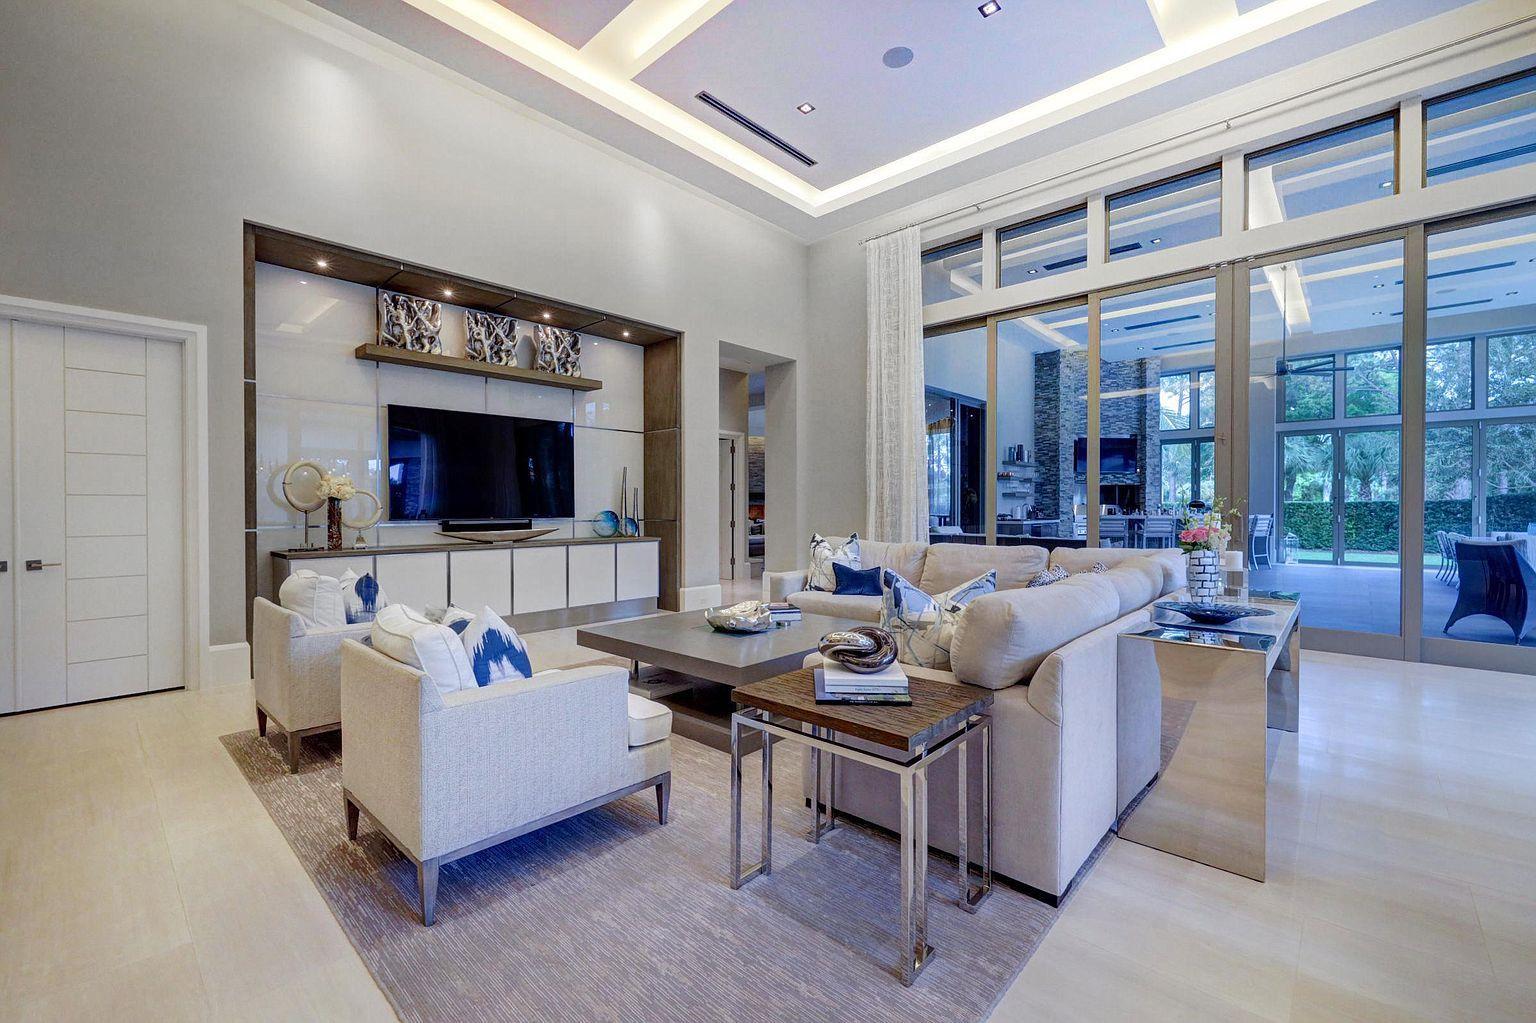 5cedceb51f12a4510c4199b76a19d54b - Rooms For Rent Palm Beach Gardens Fl